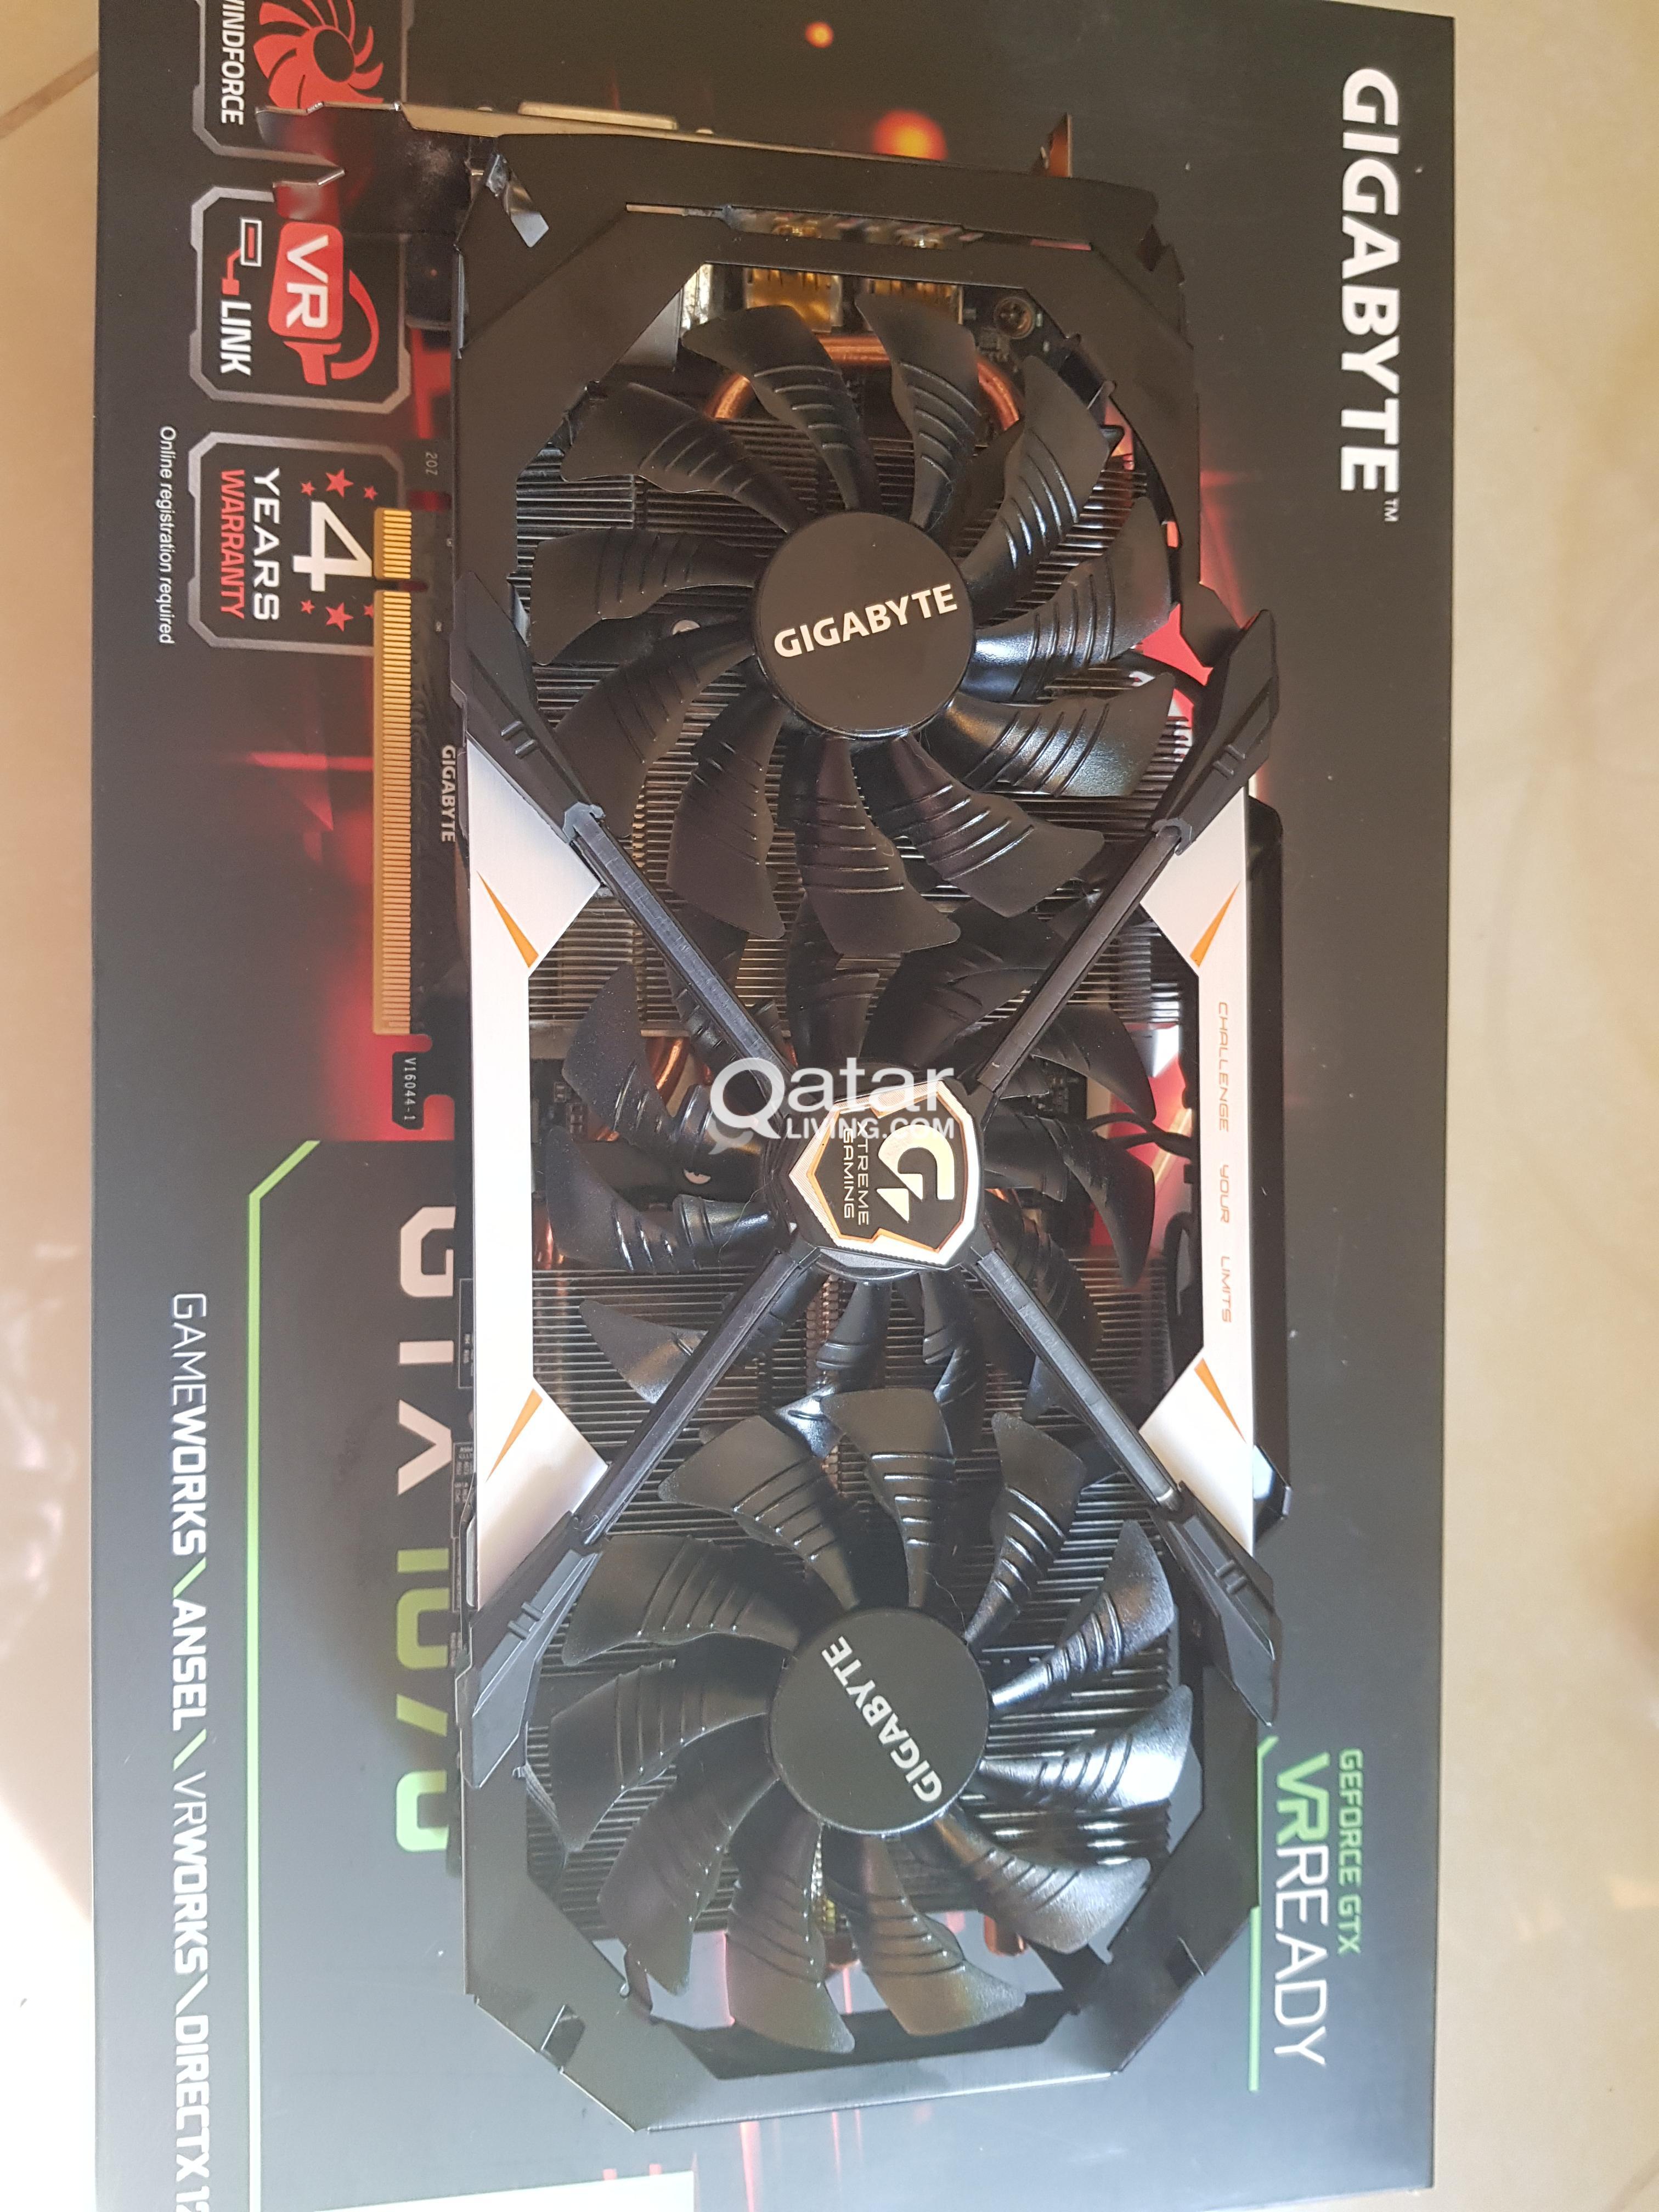 Gigabyte GeForce GTX 1070 Xtreme Gaming 8G Graphics Card | Qatar Living